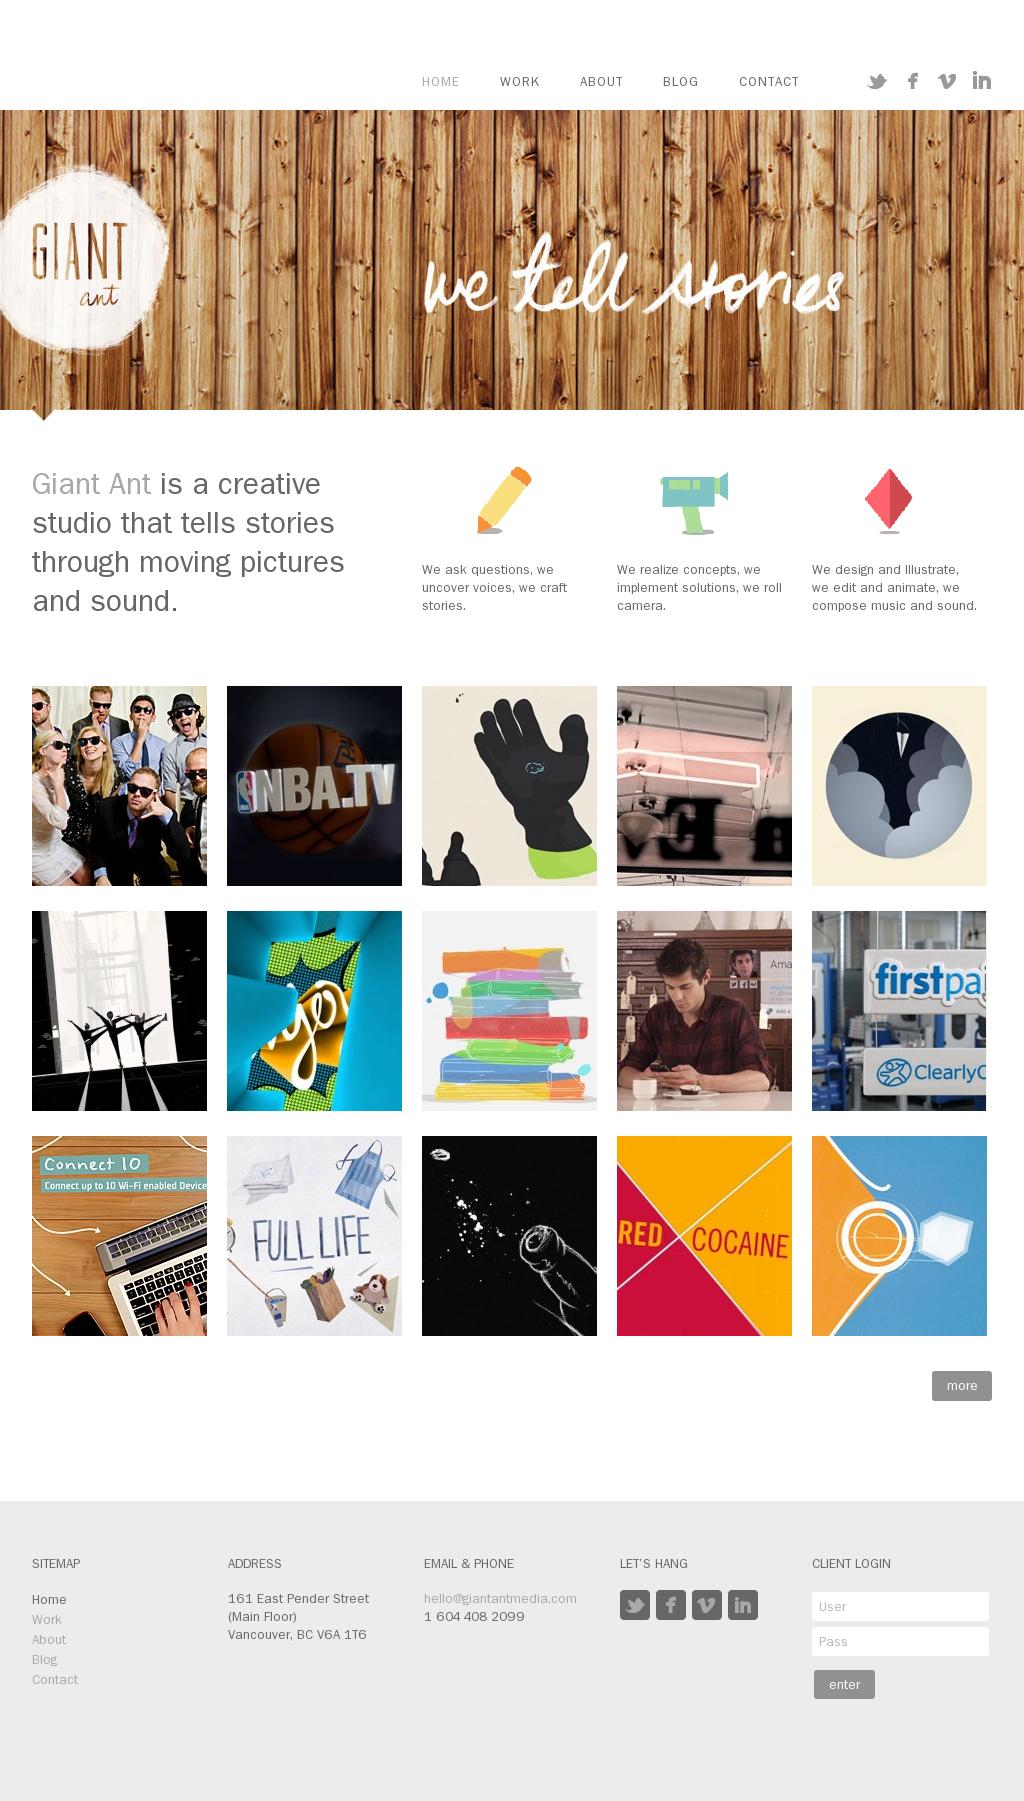 Home Giant Ant Website Banner Design Graphic Design Print Web Design